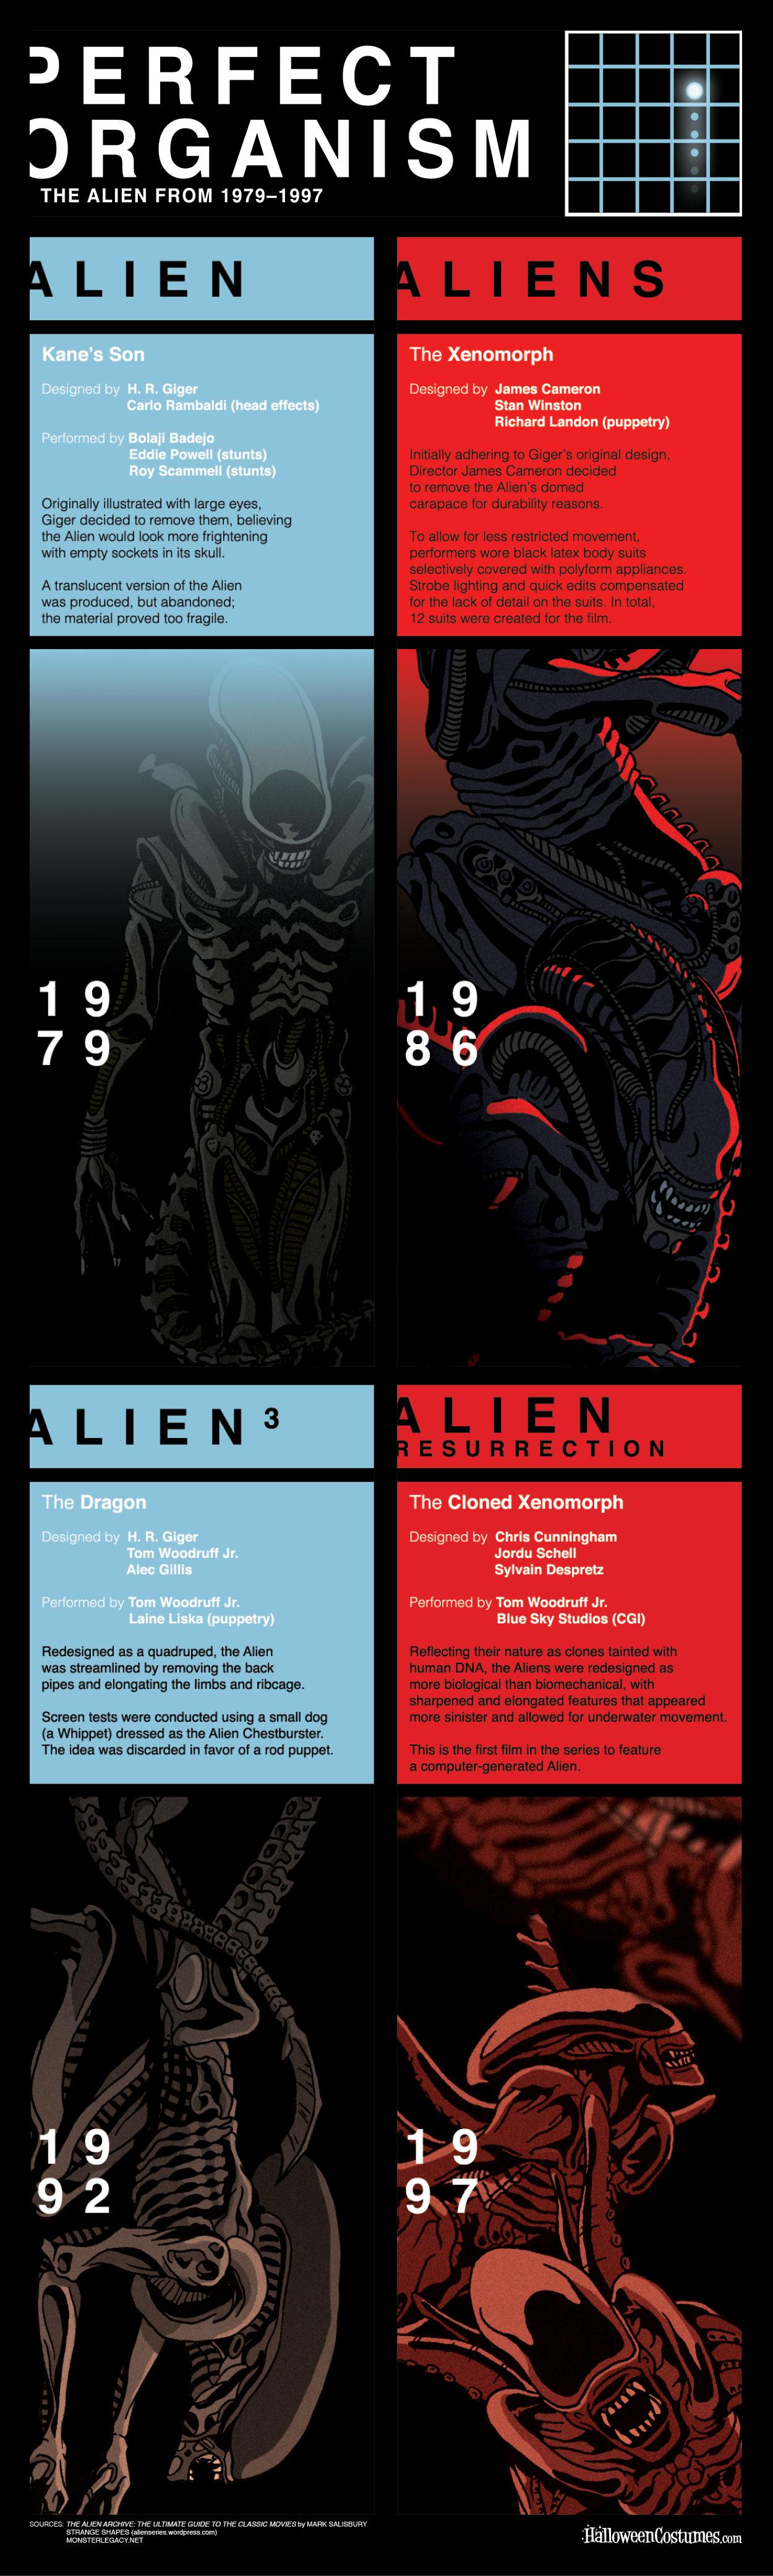 Evolution of the Alien Infographic